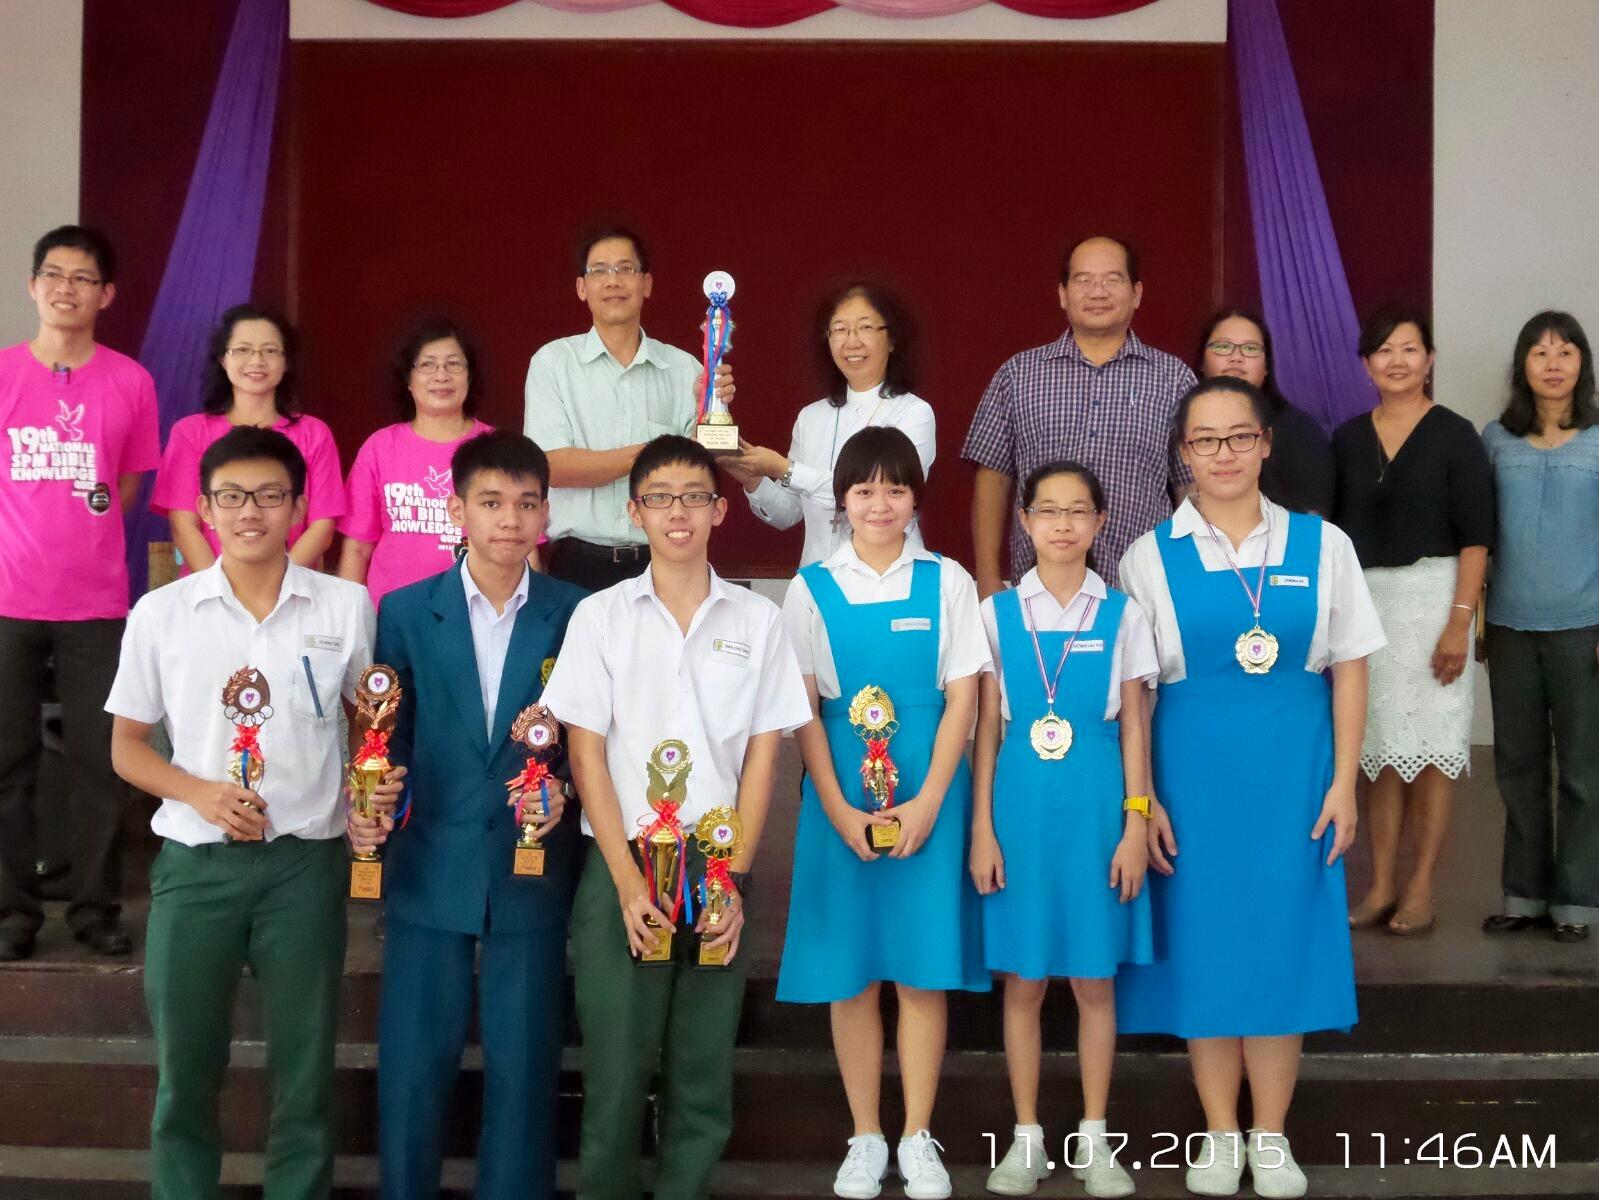 2015 BK Champions SMK Methodist Sibu